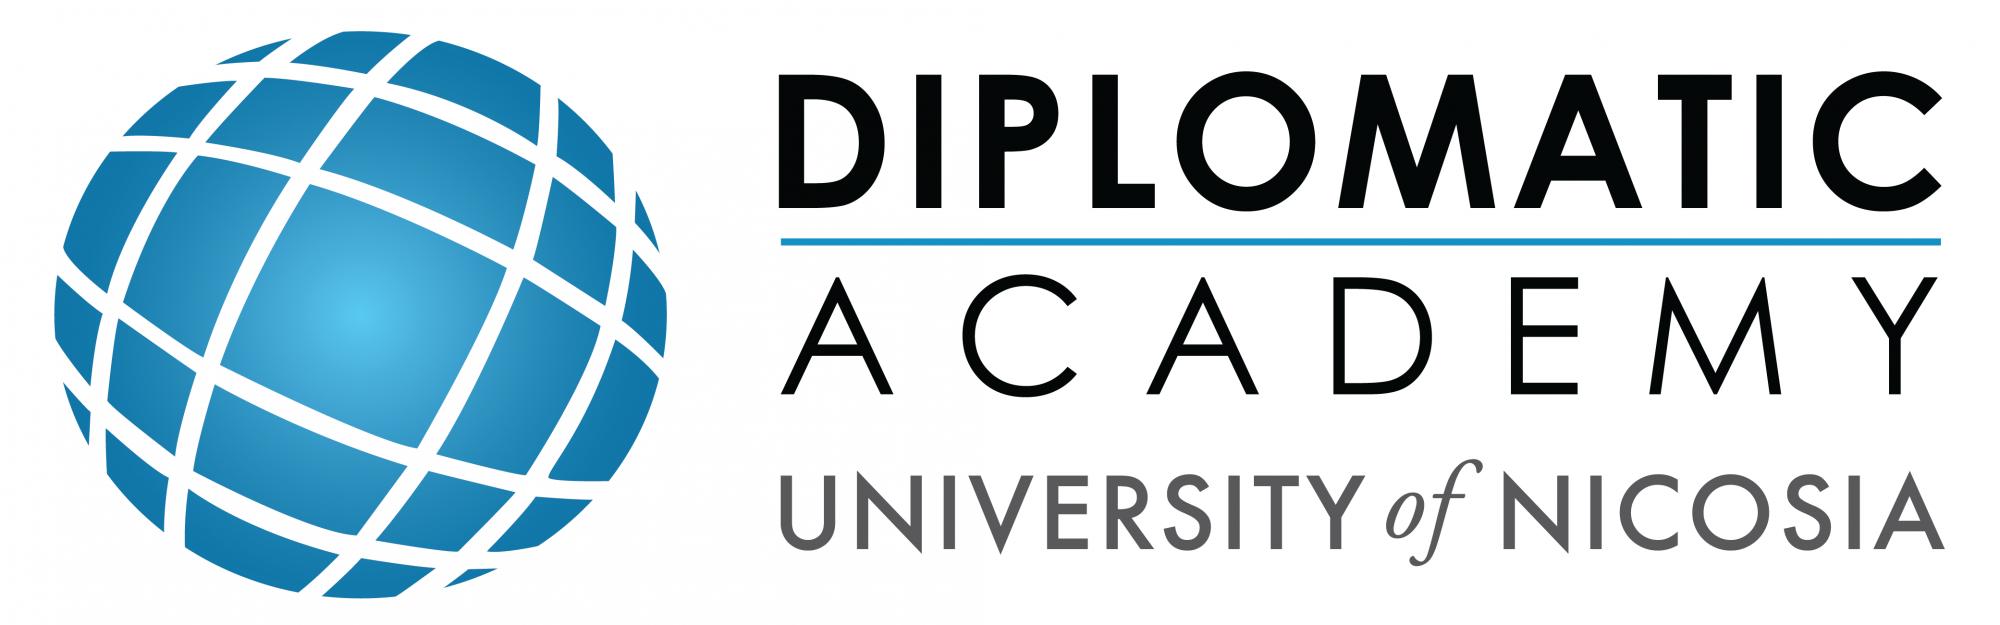 diplomaticacademy-unic